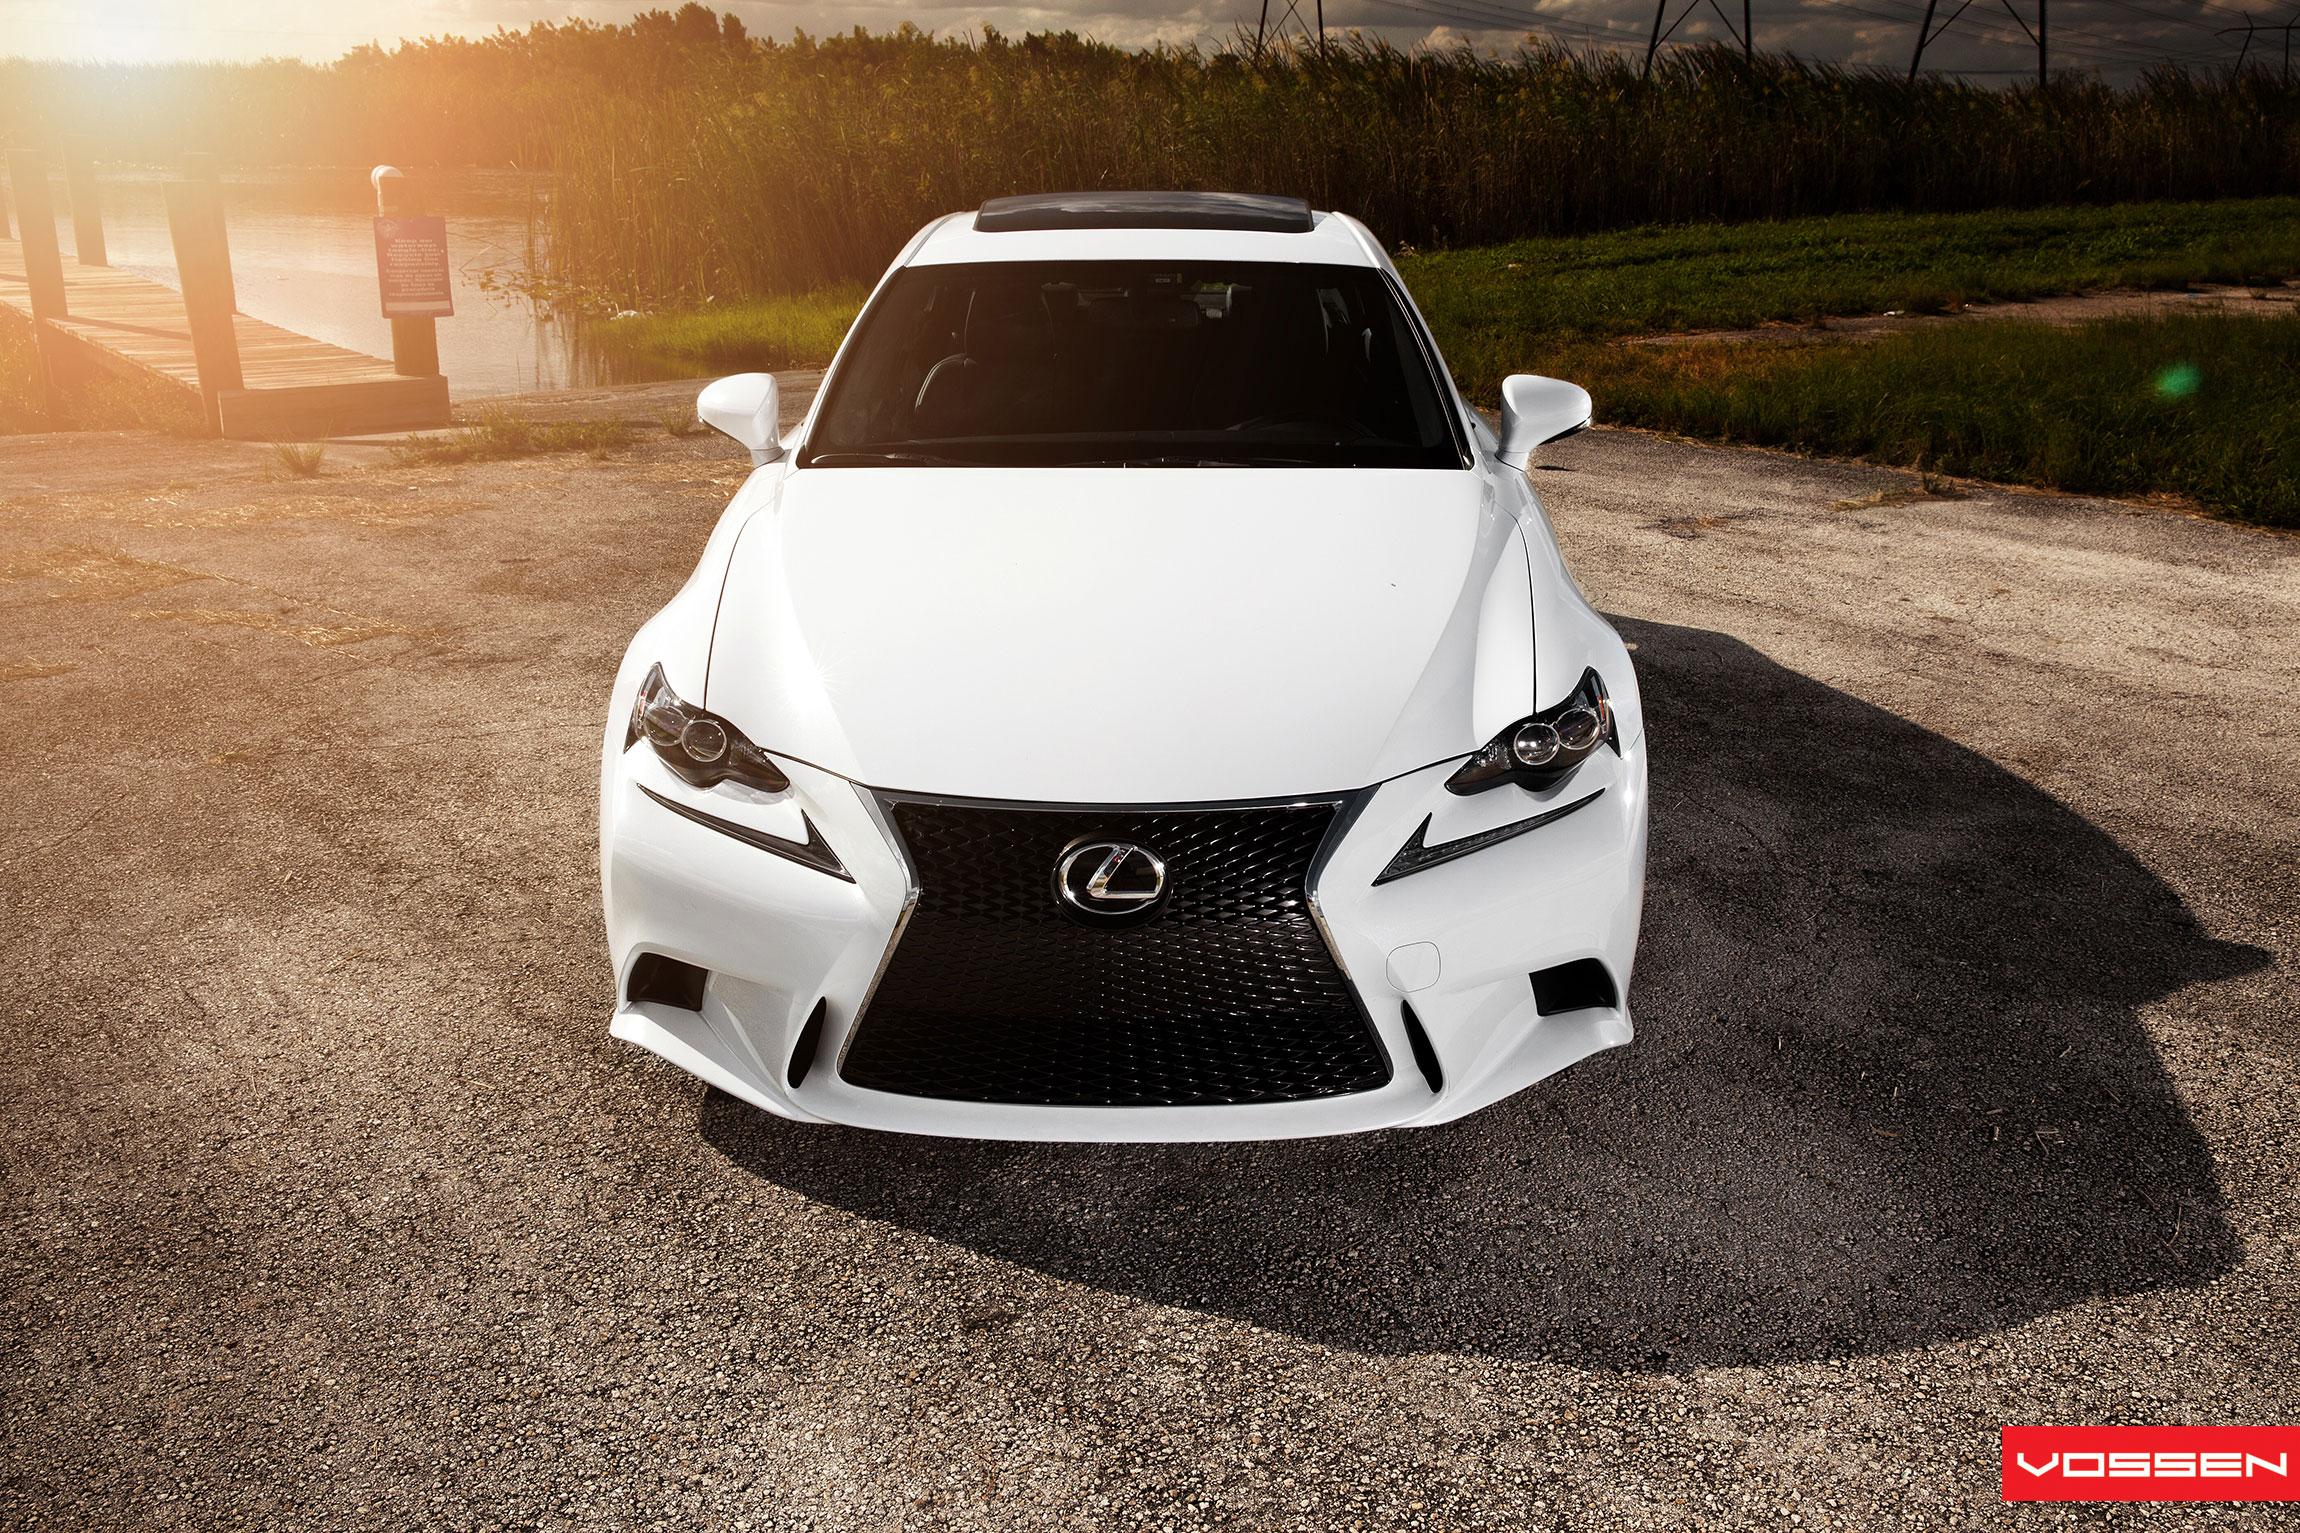 Photo Gallery Lexus IS F SPORT on New Vossen CVT Directional